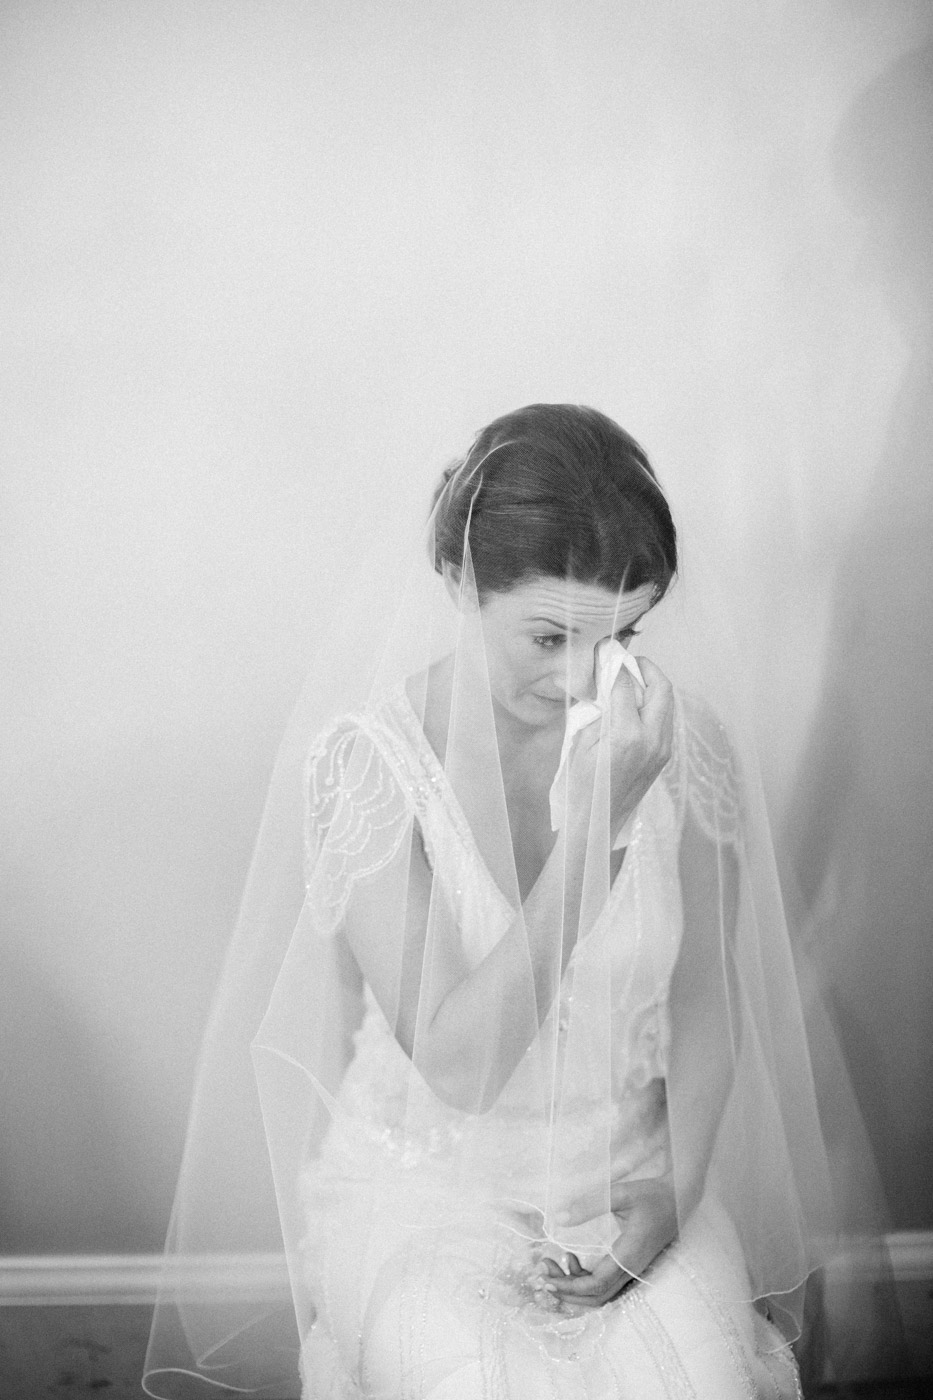 toronto_wedding_photographer_the_great_hall-56.jpg